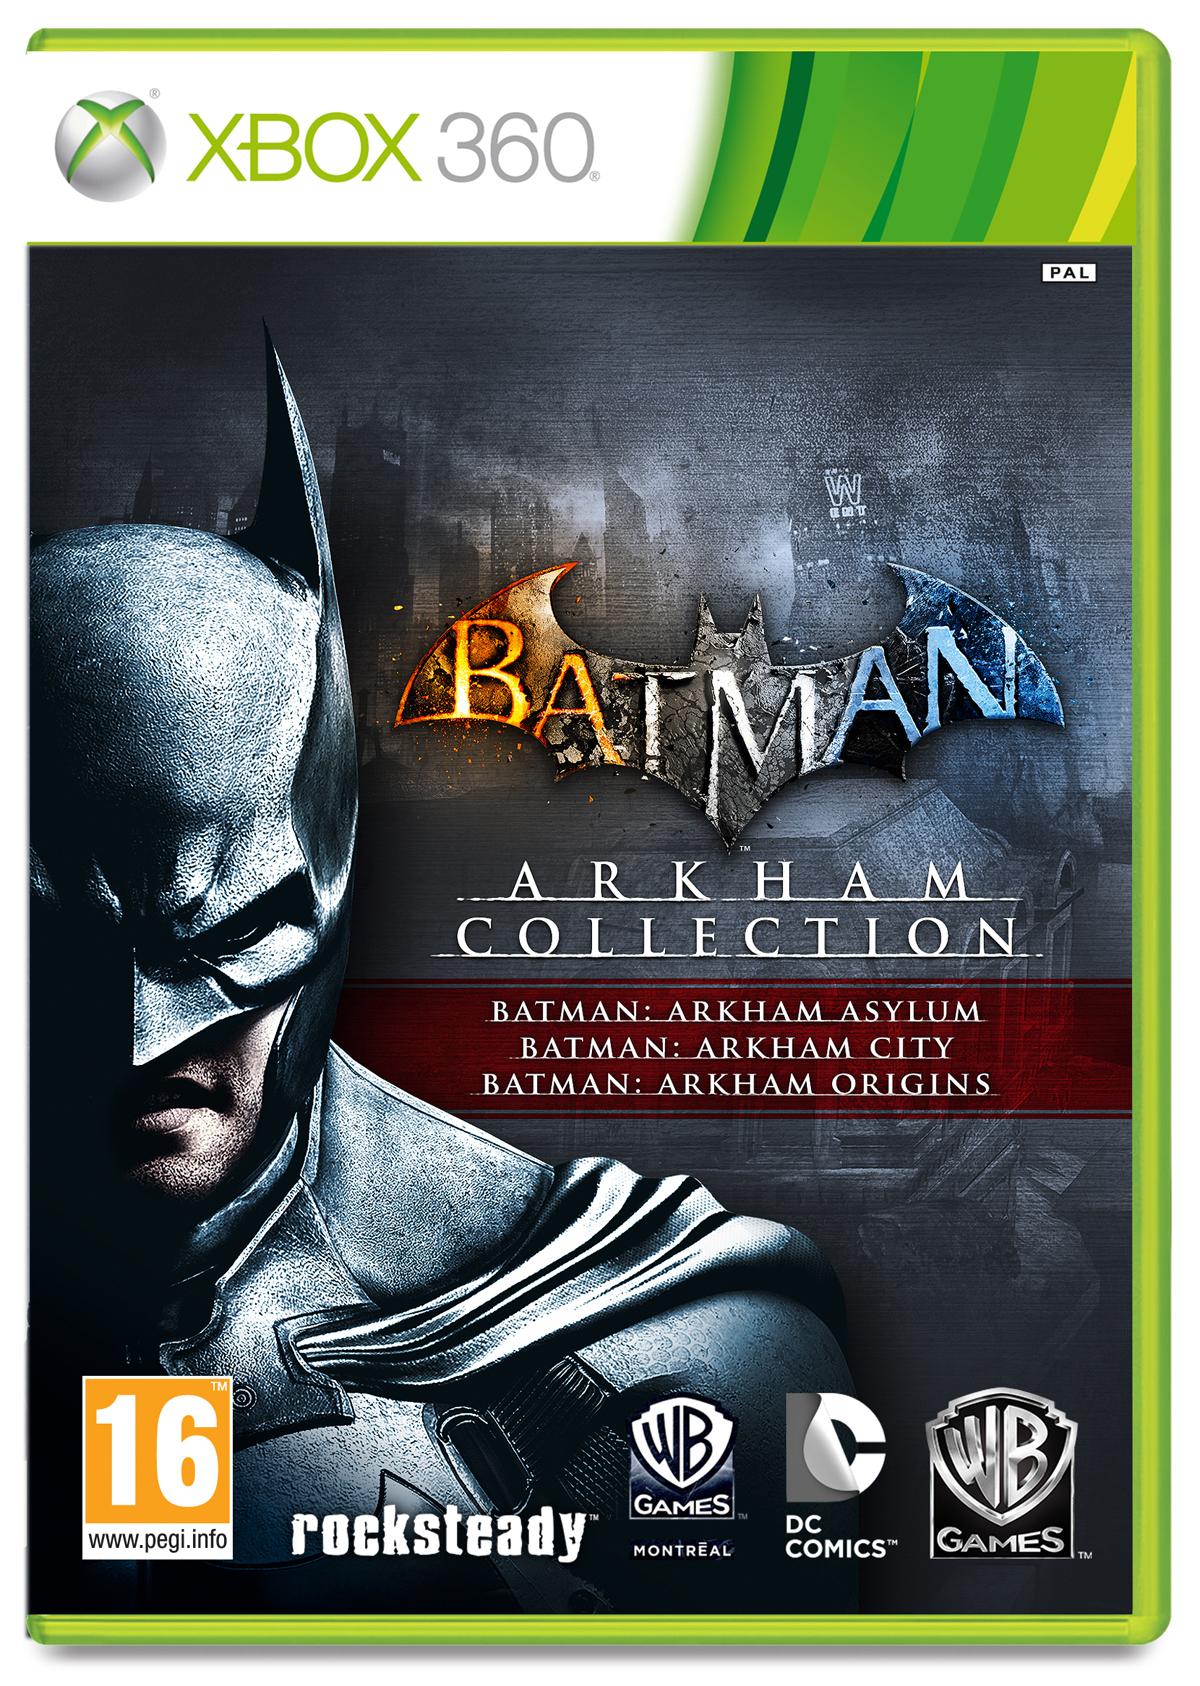 Batman  Arkham Collection anunciado! - NerdBunker 18ad66baf37